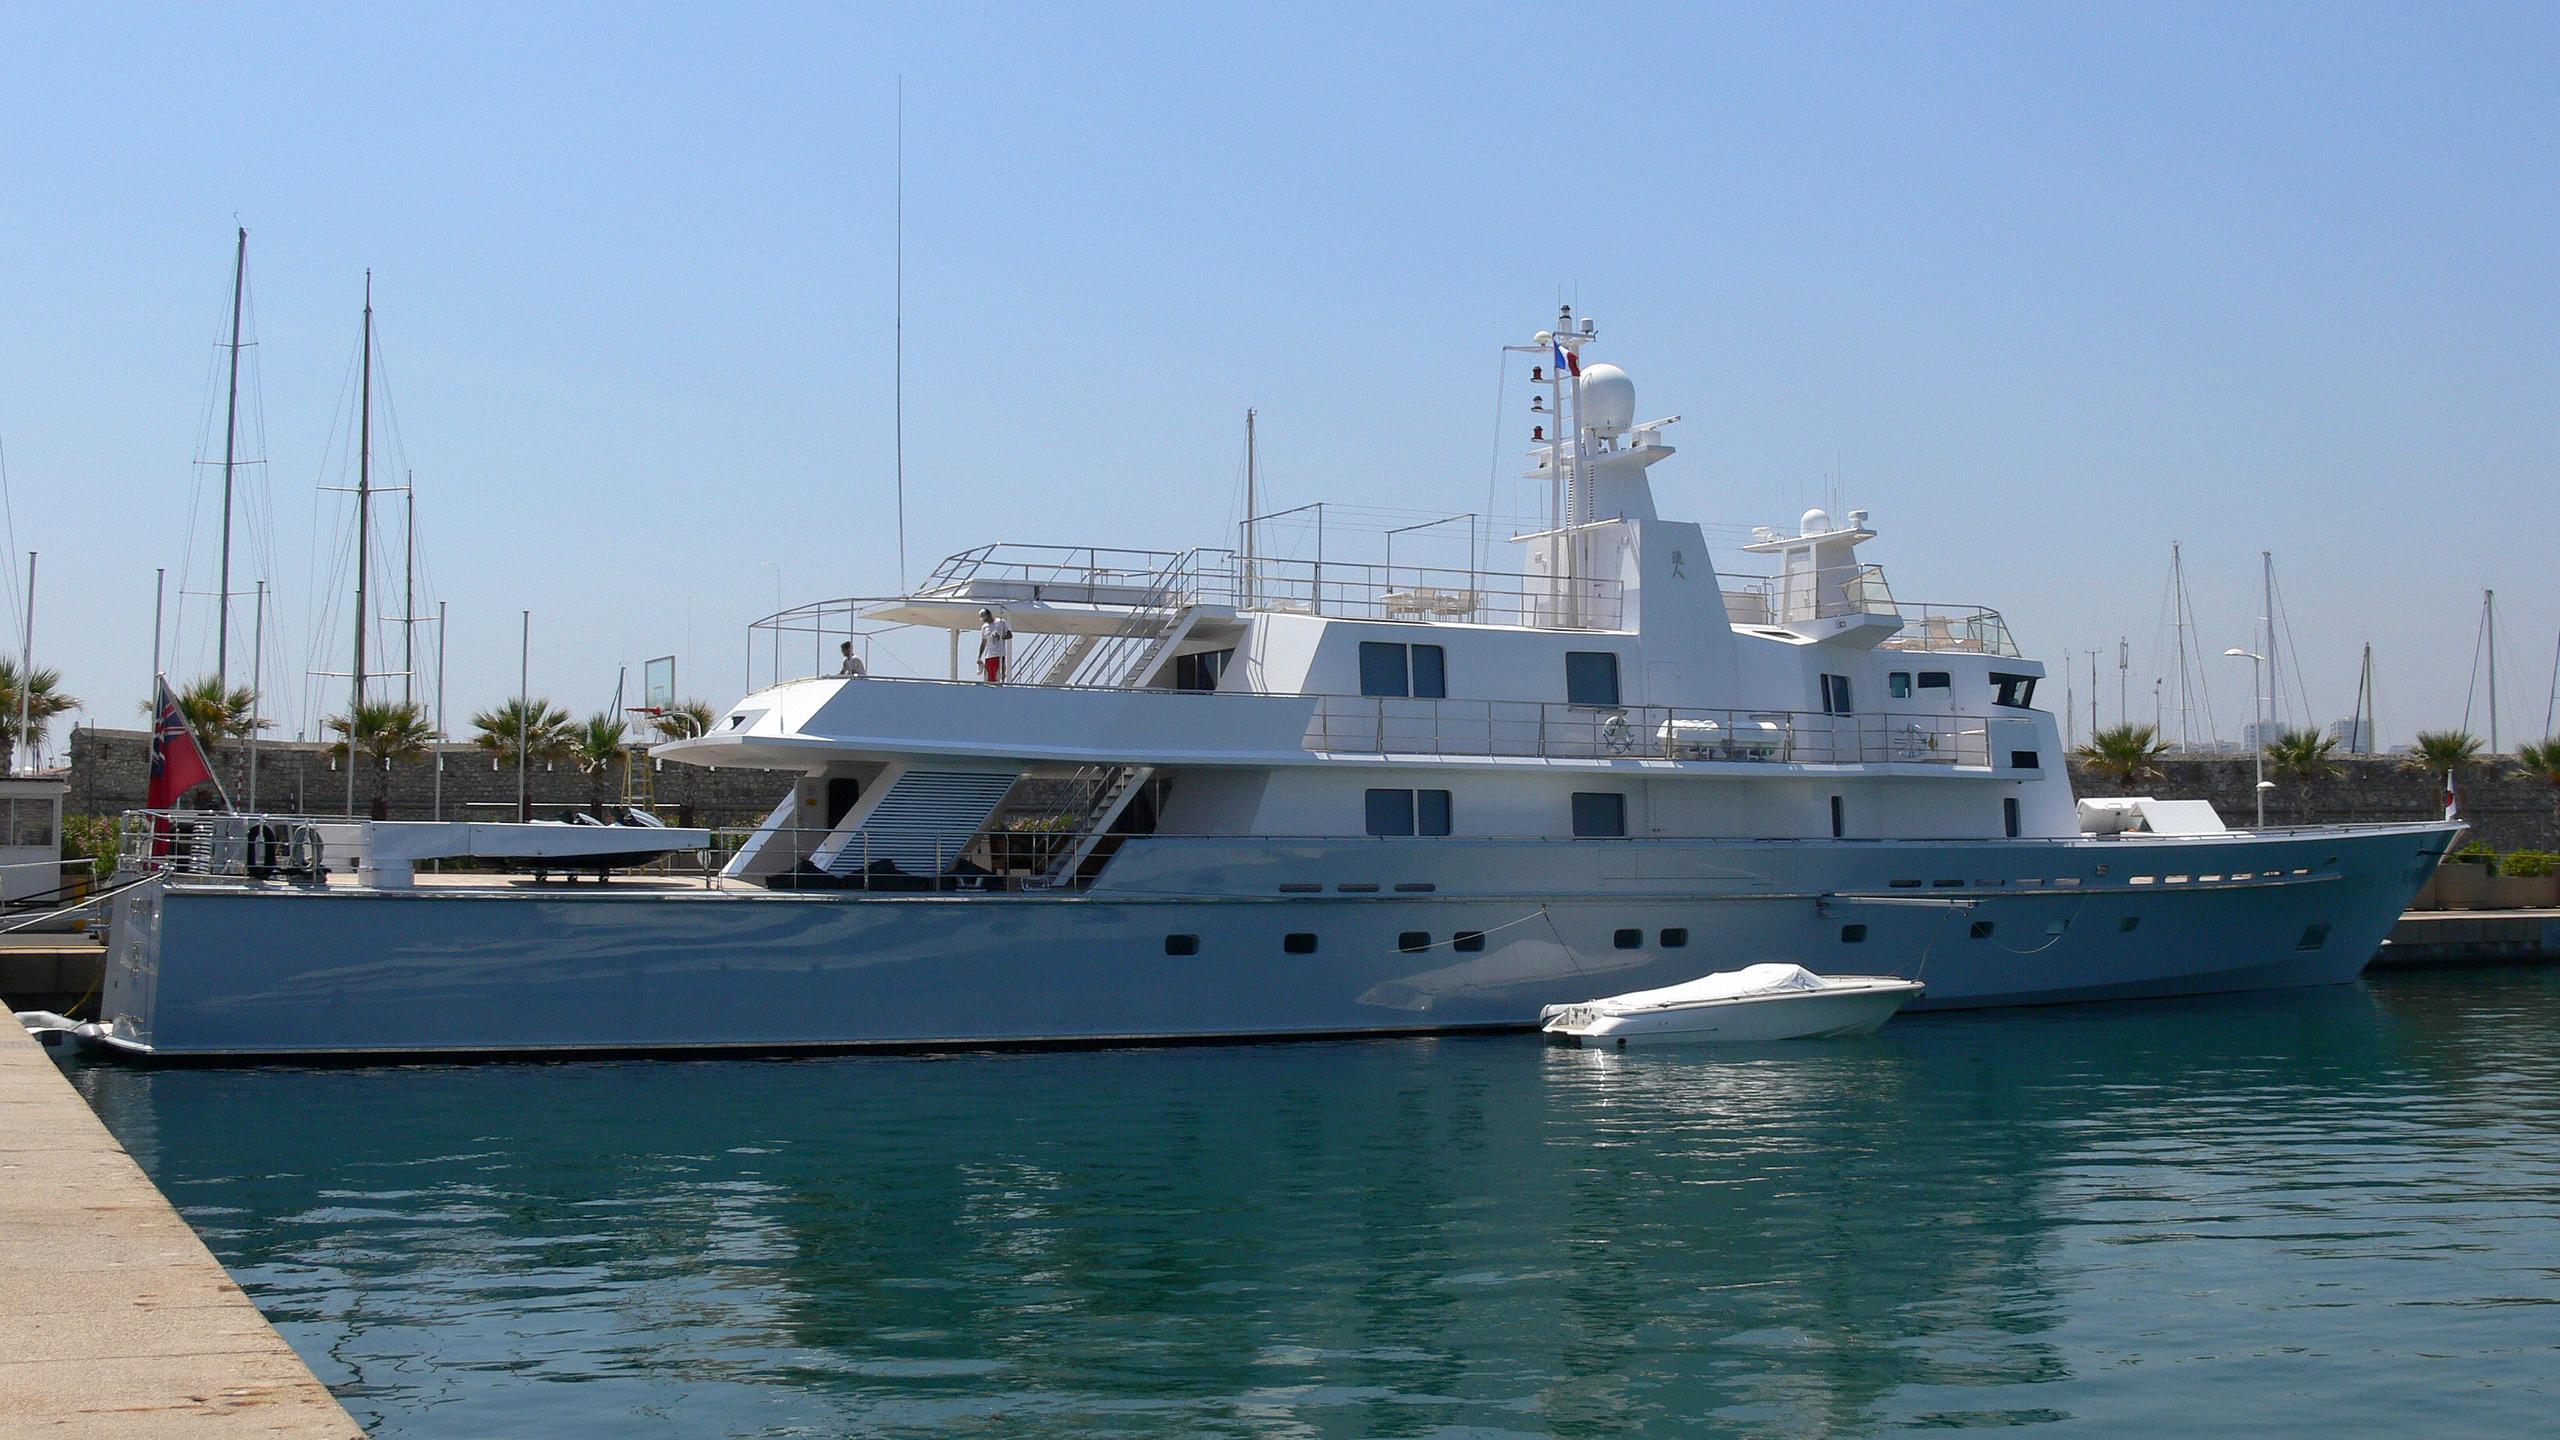 ronin-motor-yacht-lurssen-1993-58m-profile